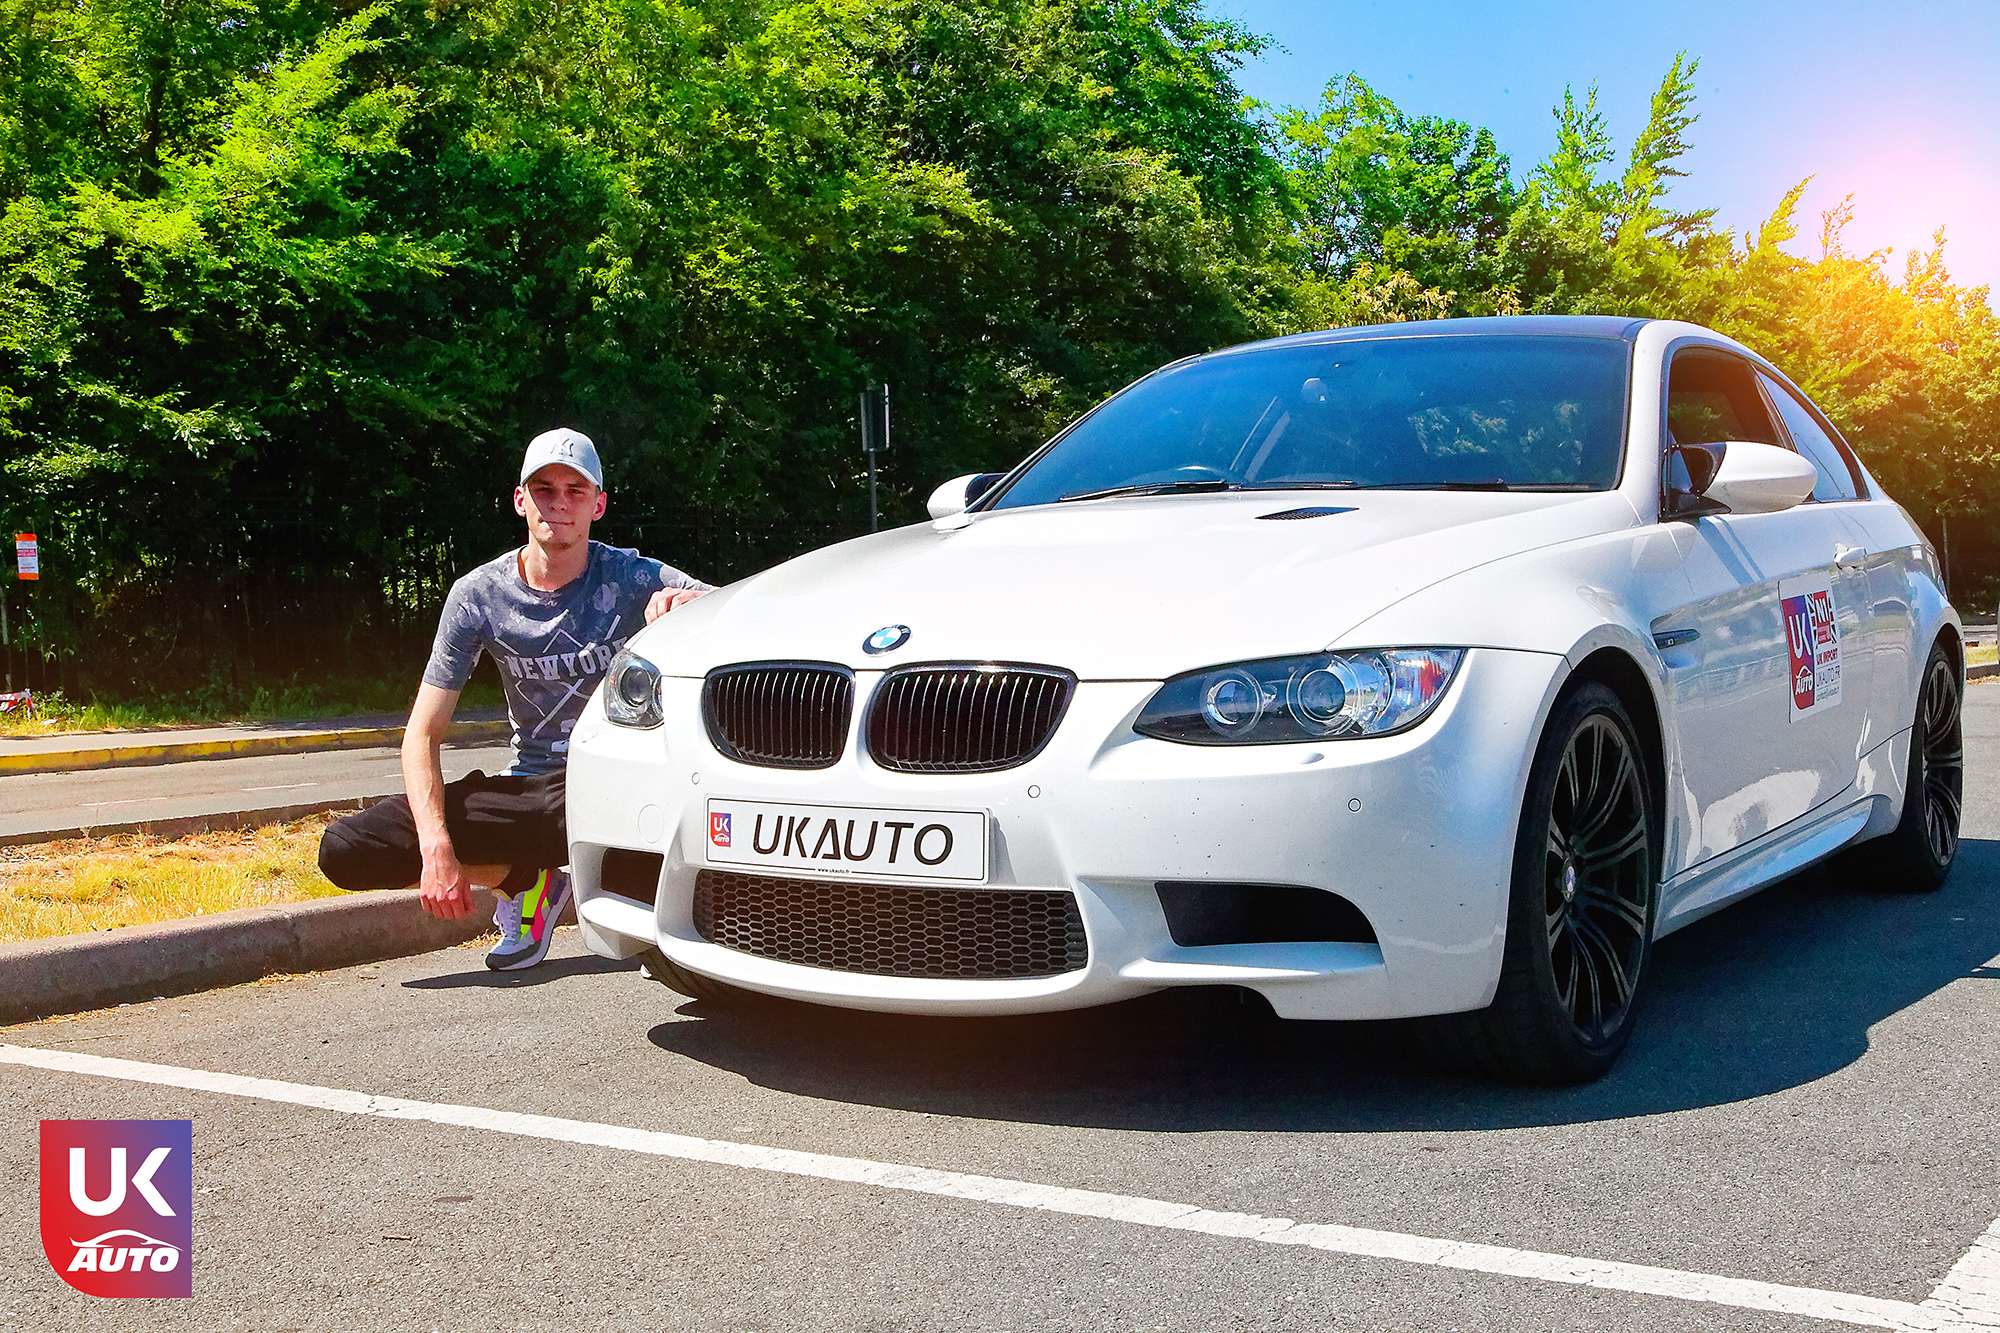 BMW m3 E92 import auto mandataire angleterre uk londres bmw leboncoin achat angleterre bmw voiture anglaise auto rhd e92 uk auto17 - Felecitation a Clement pour cette BMW M3 E92 COUPE RHD PACK CARBON BMW ANGLETERRE VOITURE UK